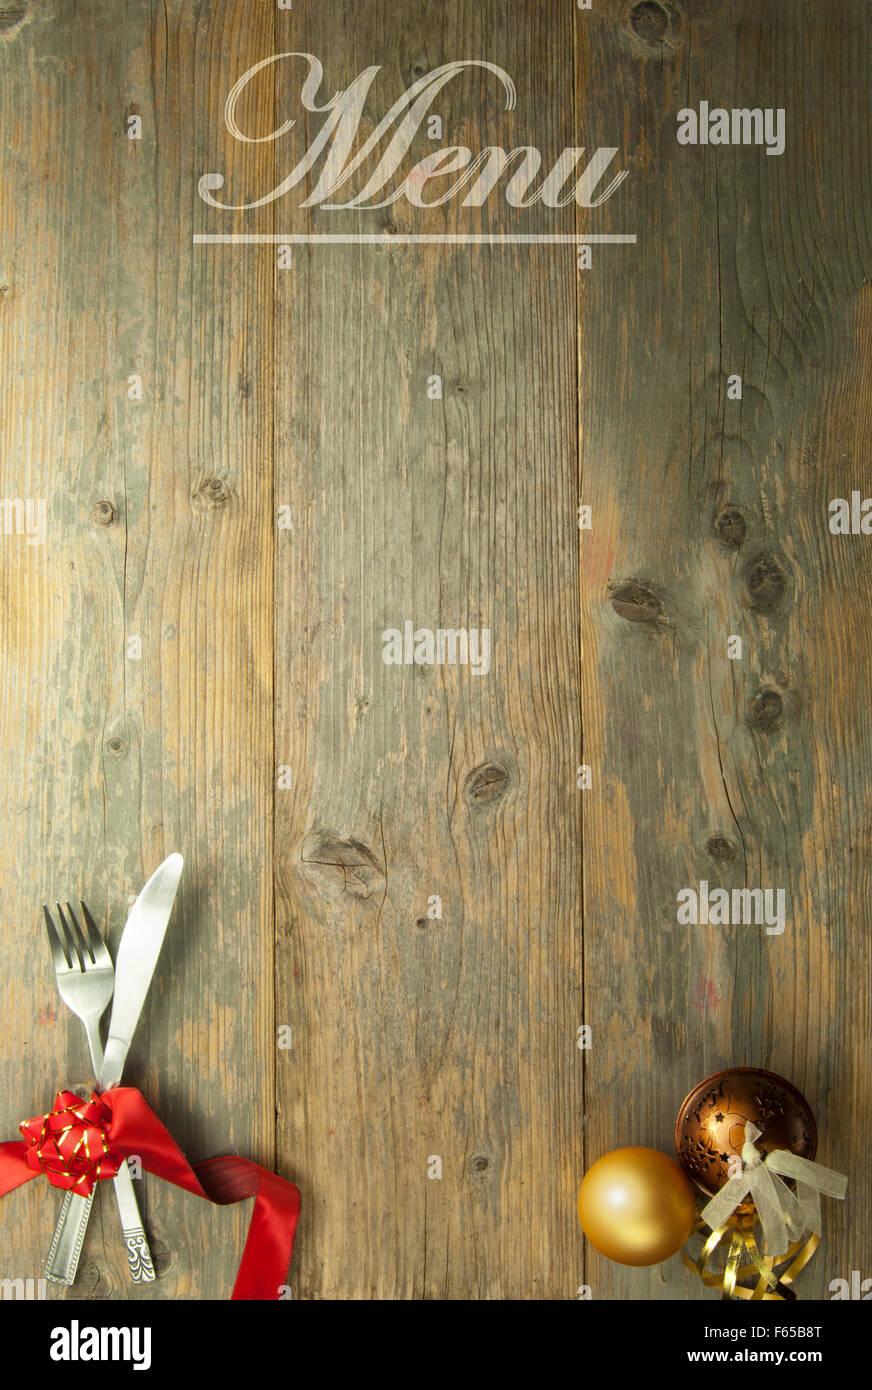 Black Wood Wallpaper Christmas Menu Background Stock Photo Royalty Free Image